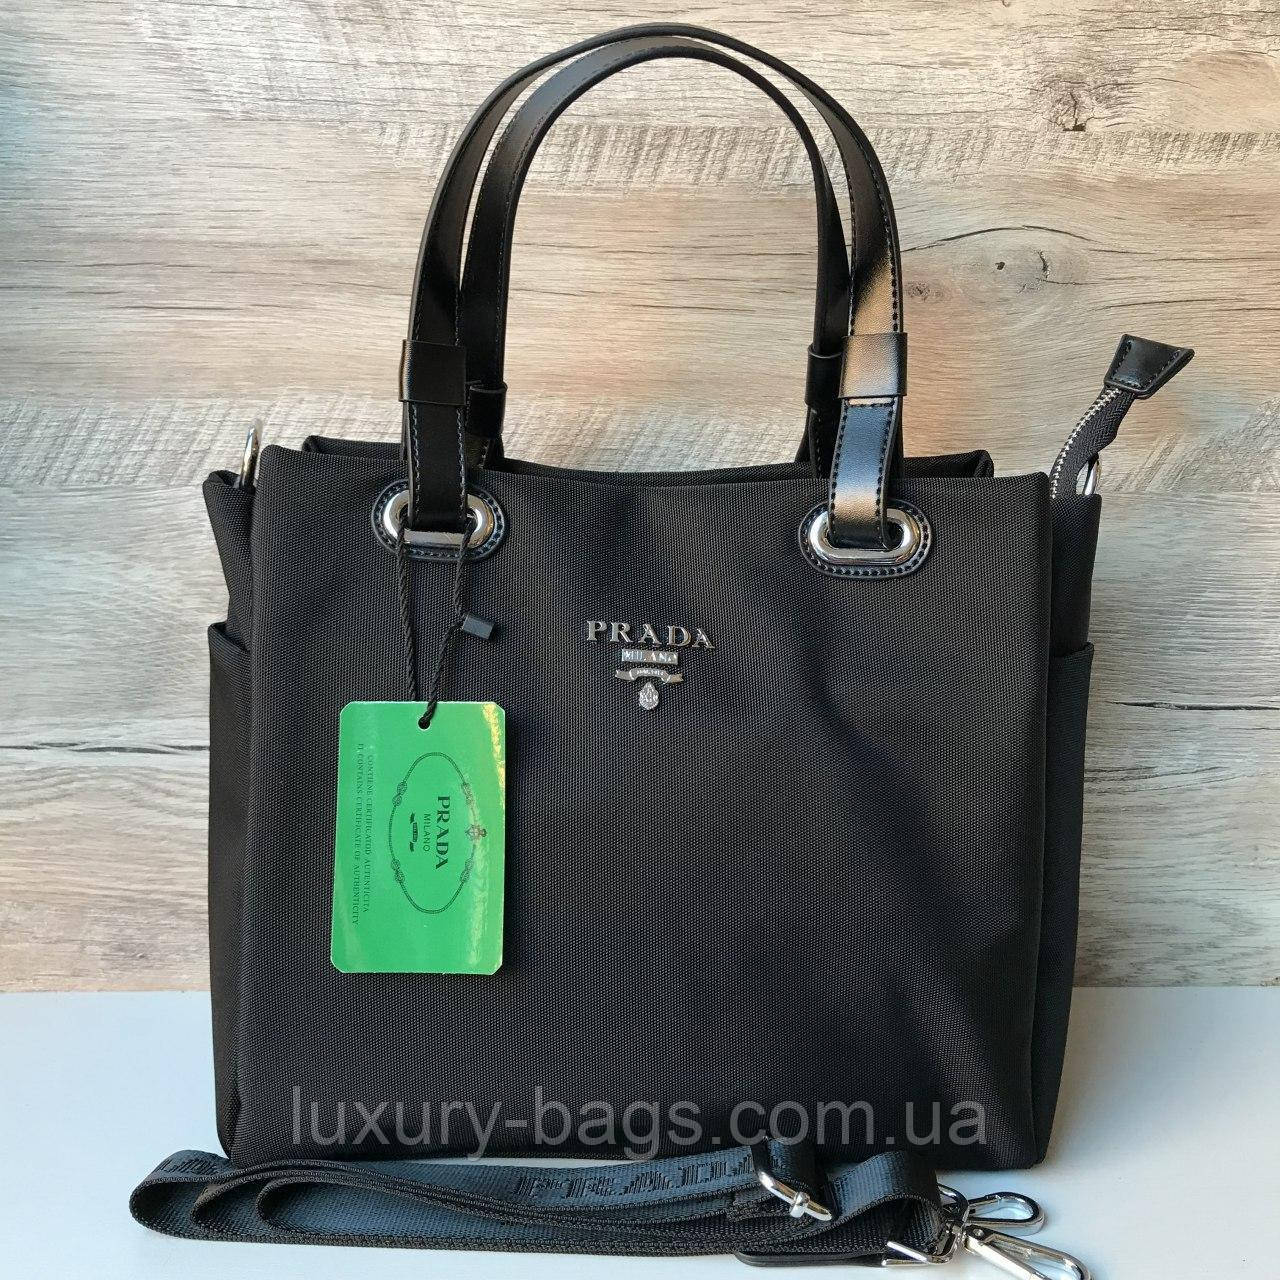 Велика текстильна сумка Prada